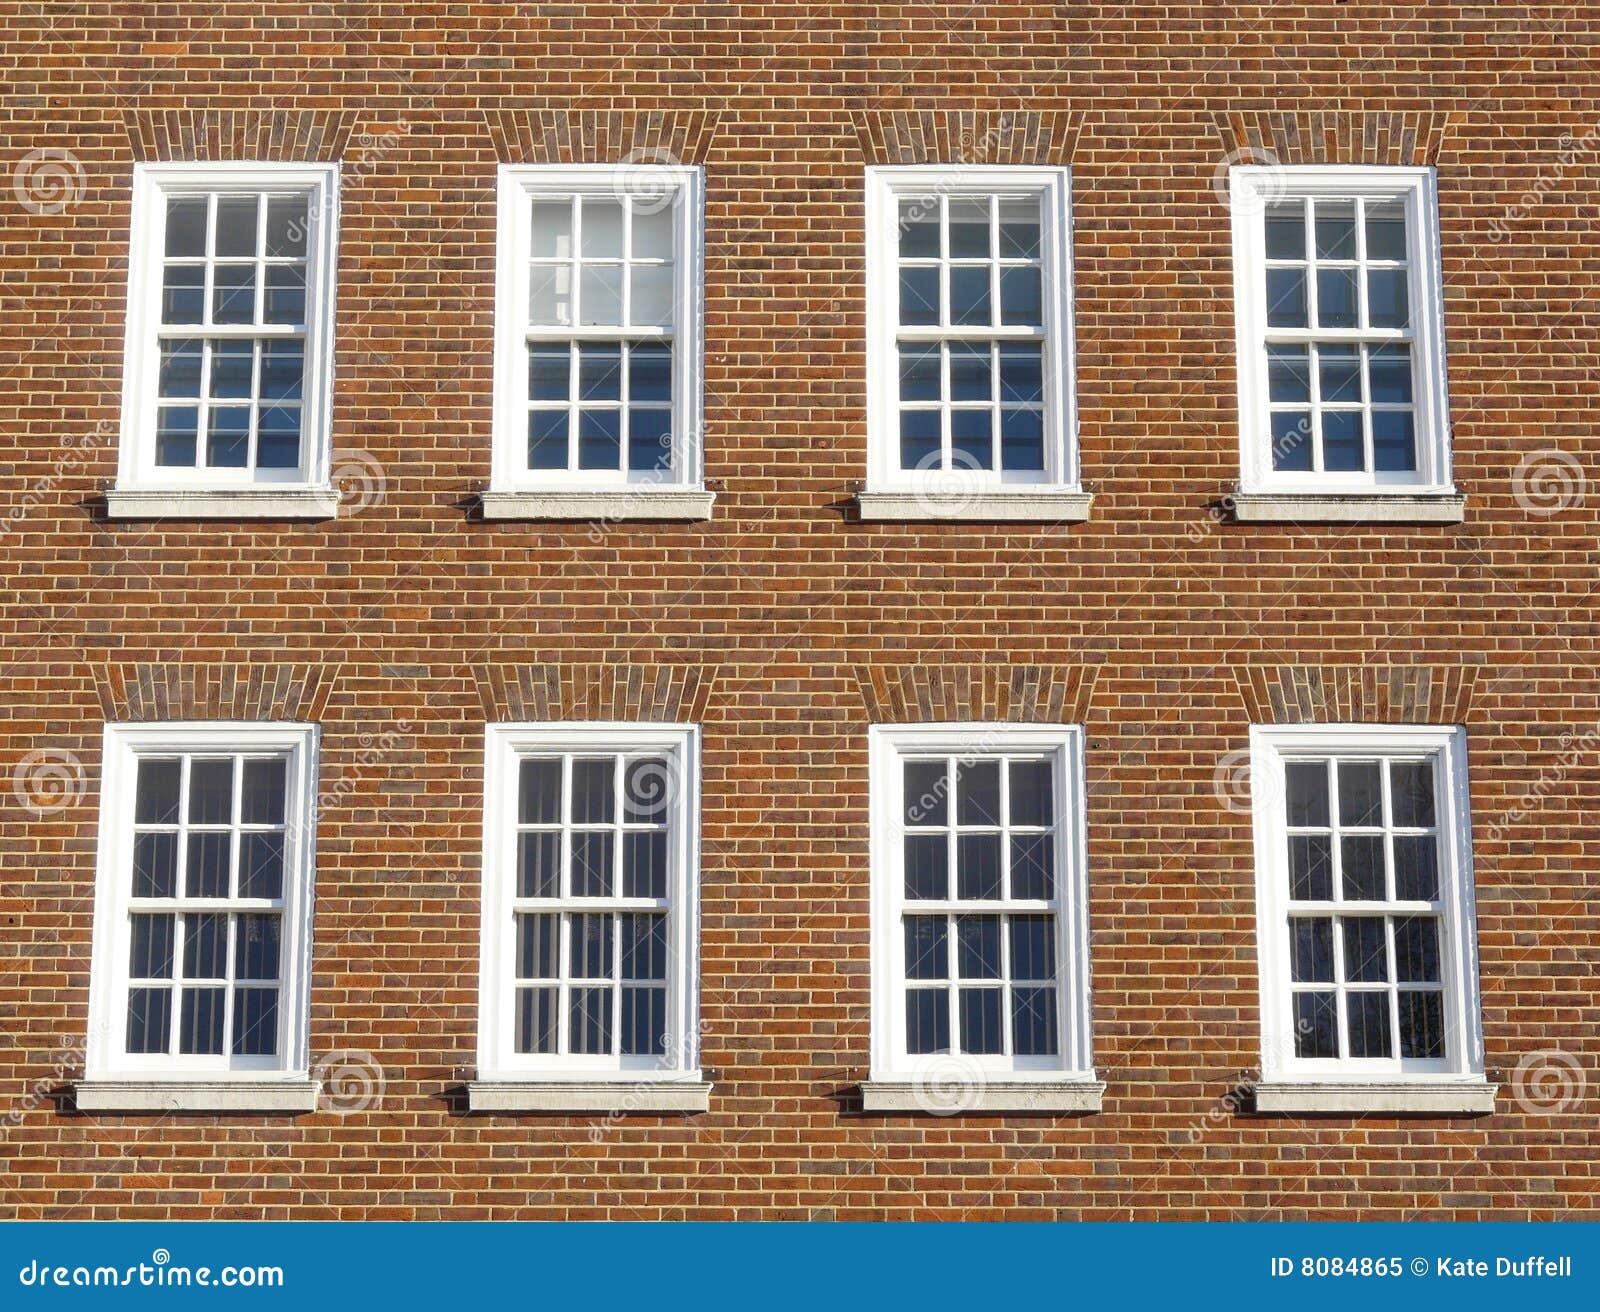 Georgian Windows Royalty Free Stock Photo Image 8084865